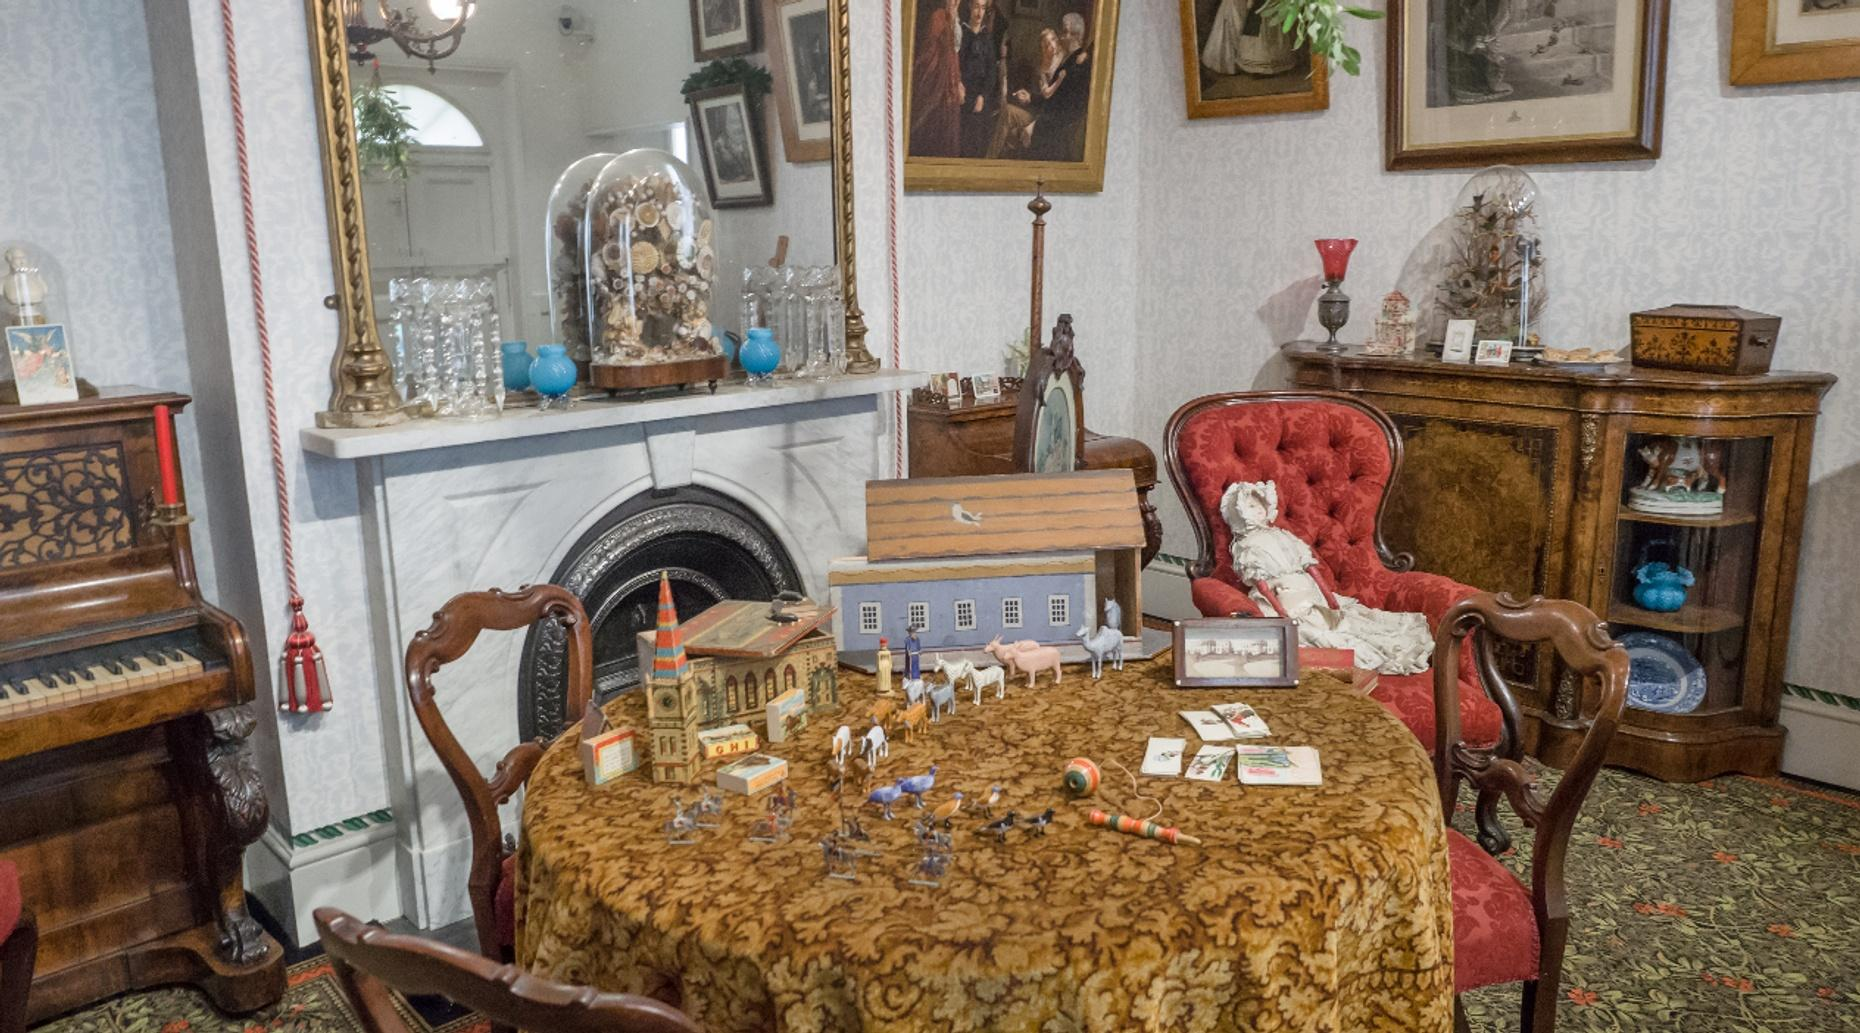 Aunt Esther's Condo Escape Game in Fort Lauderdale